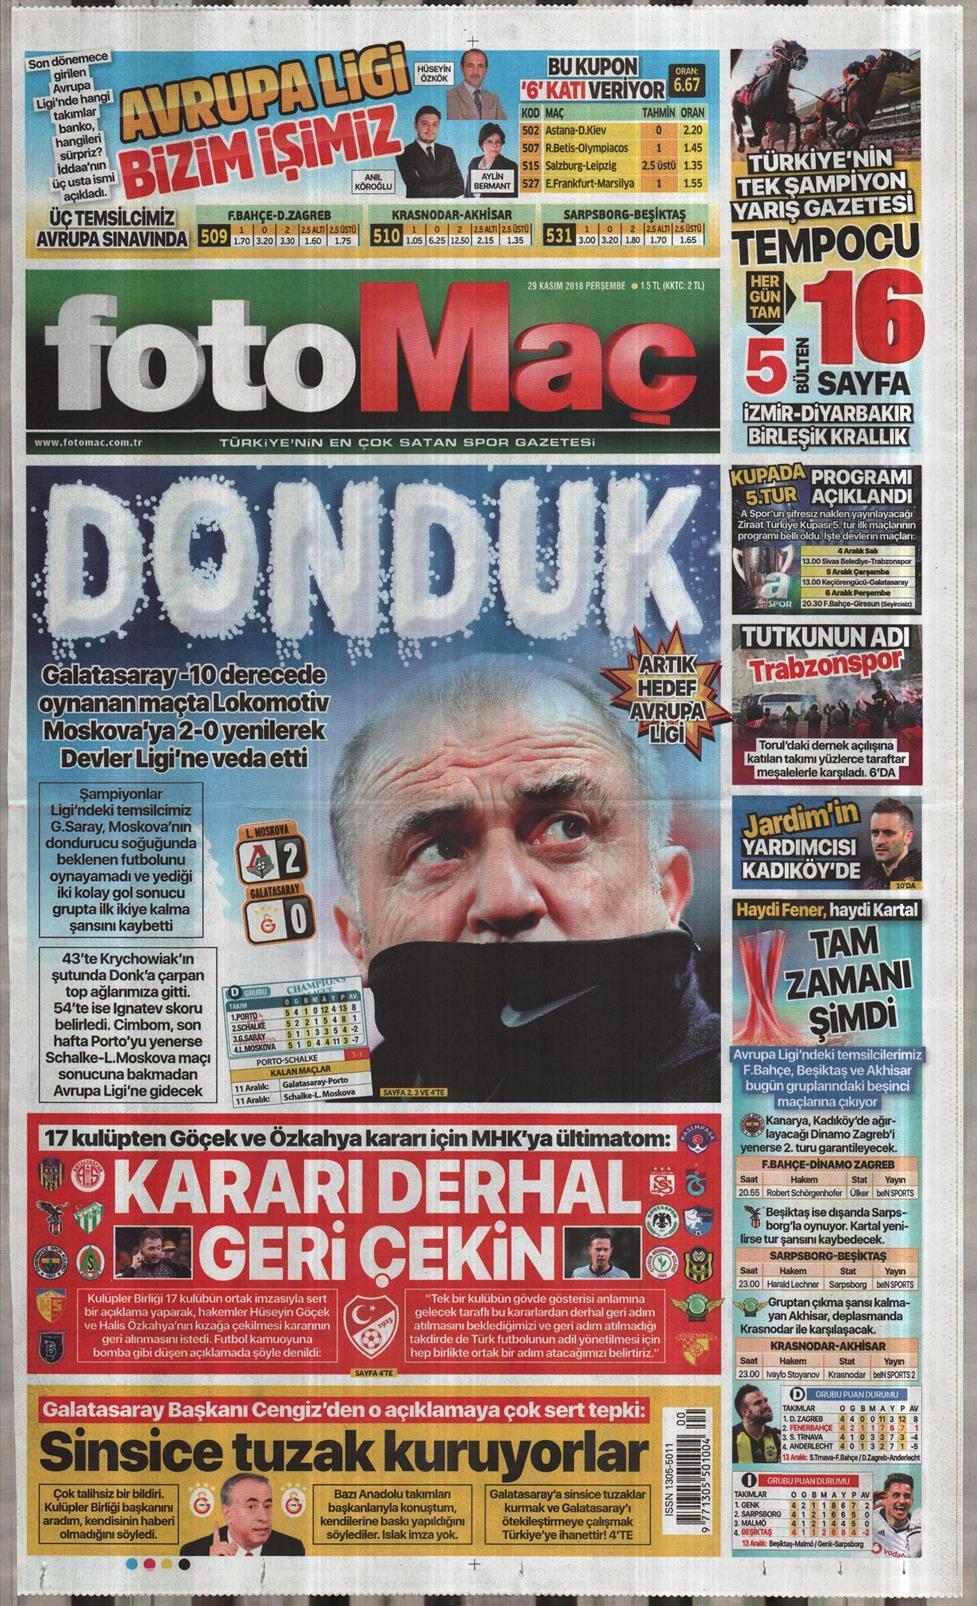 12 Nisan 2019 Cuma Fotomaç Gazetesi Manşet